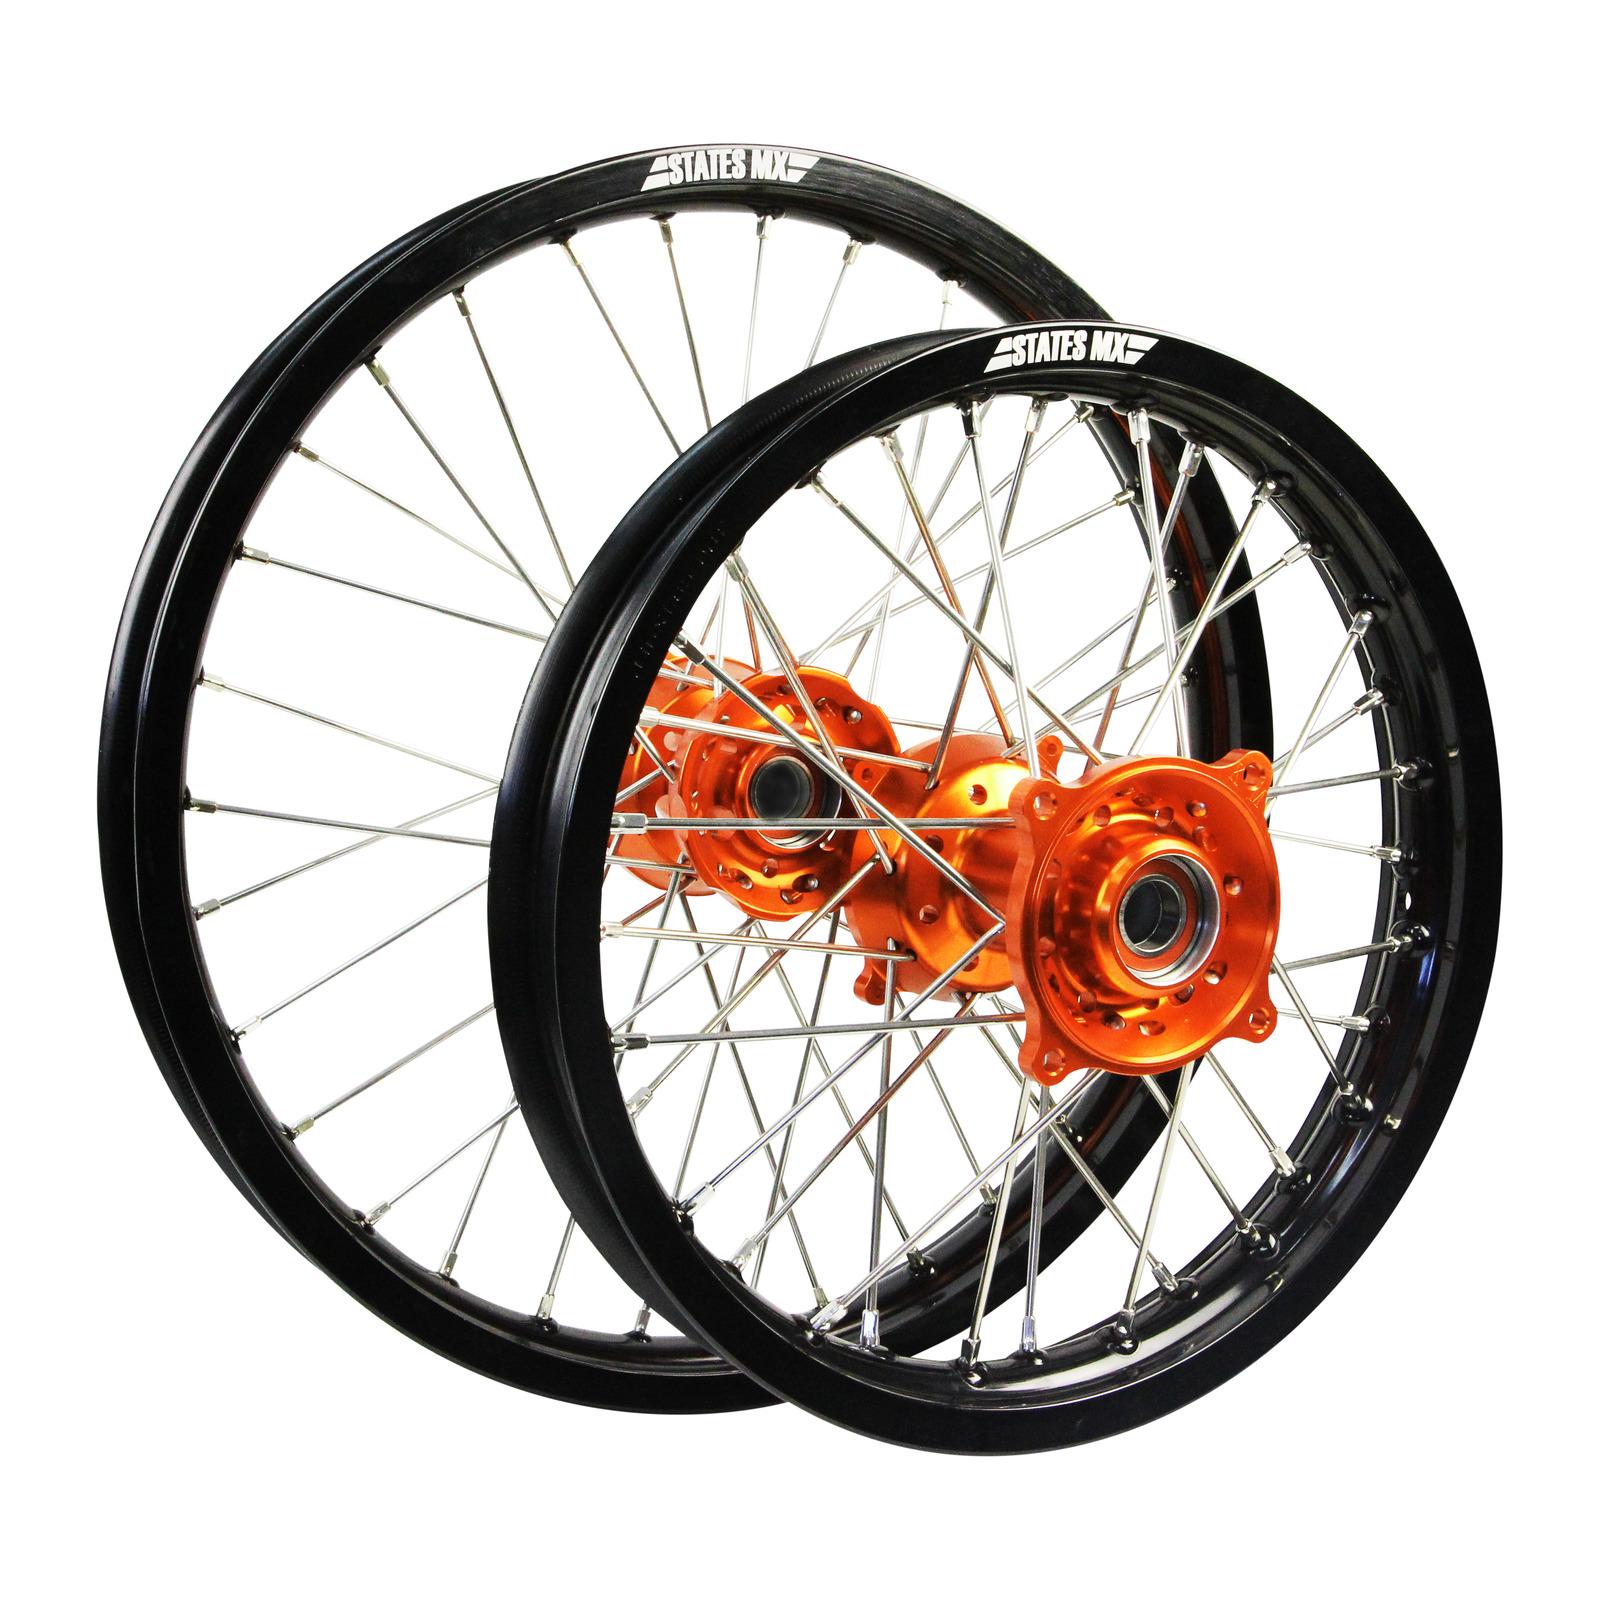 states mx new ktm 65 sx 2000-2017 small wheel motocross black